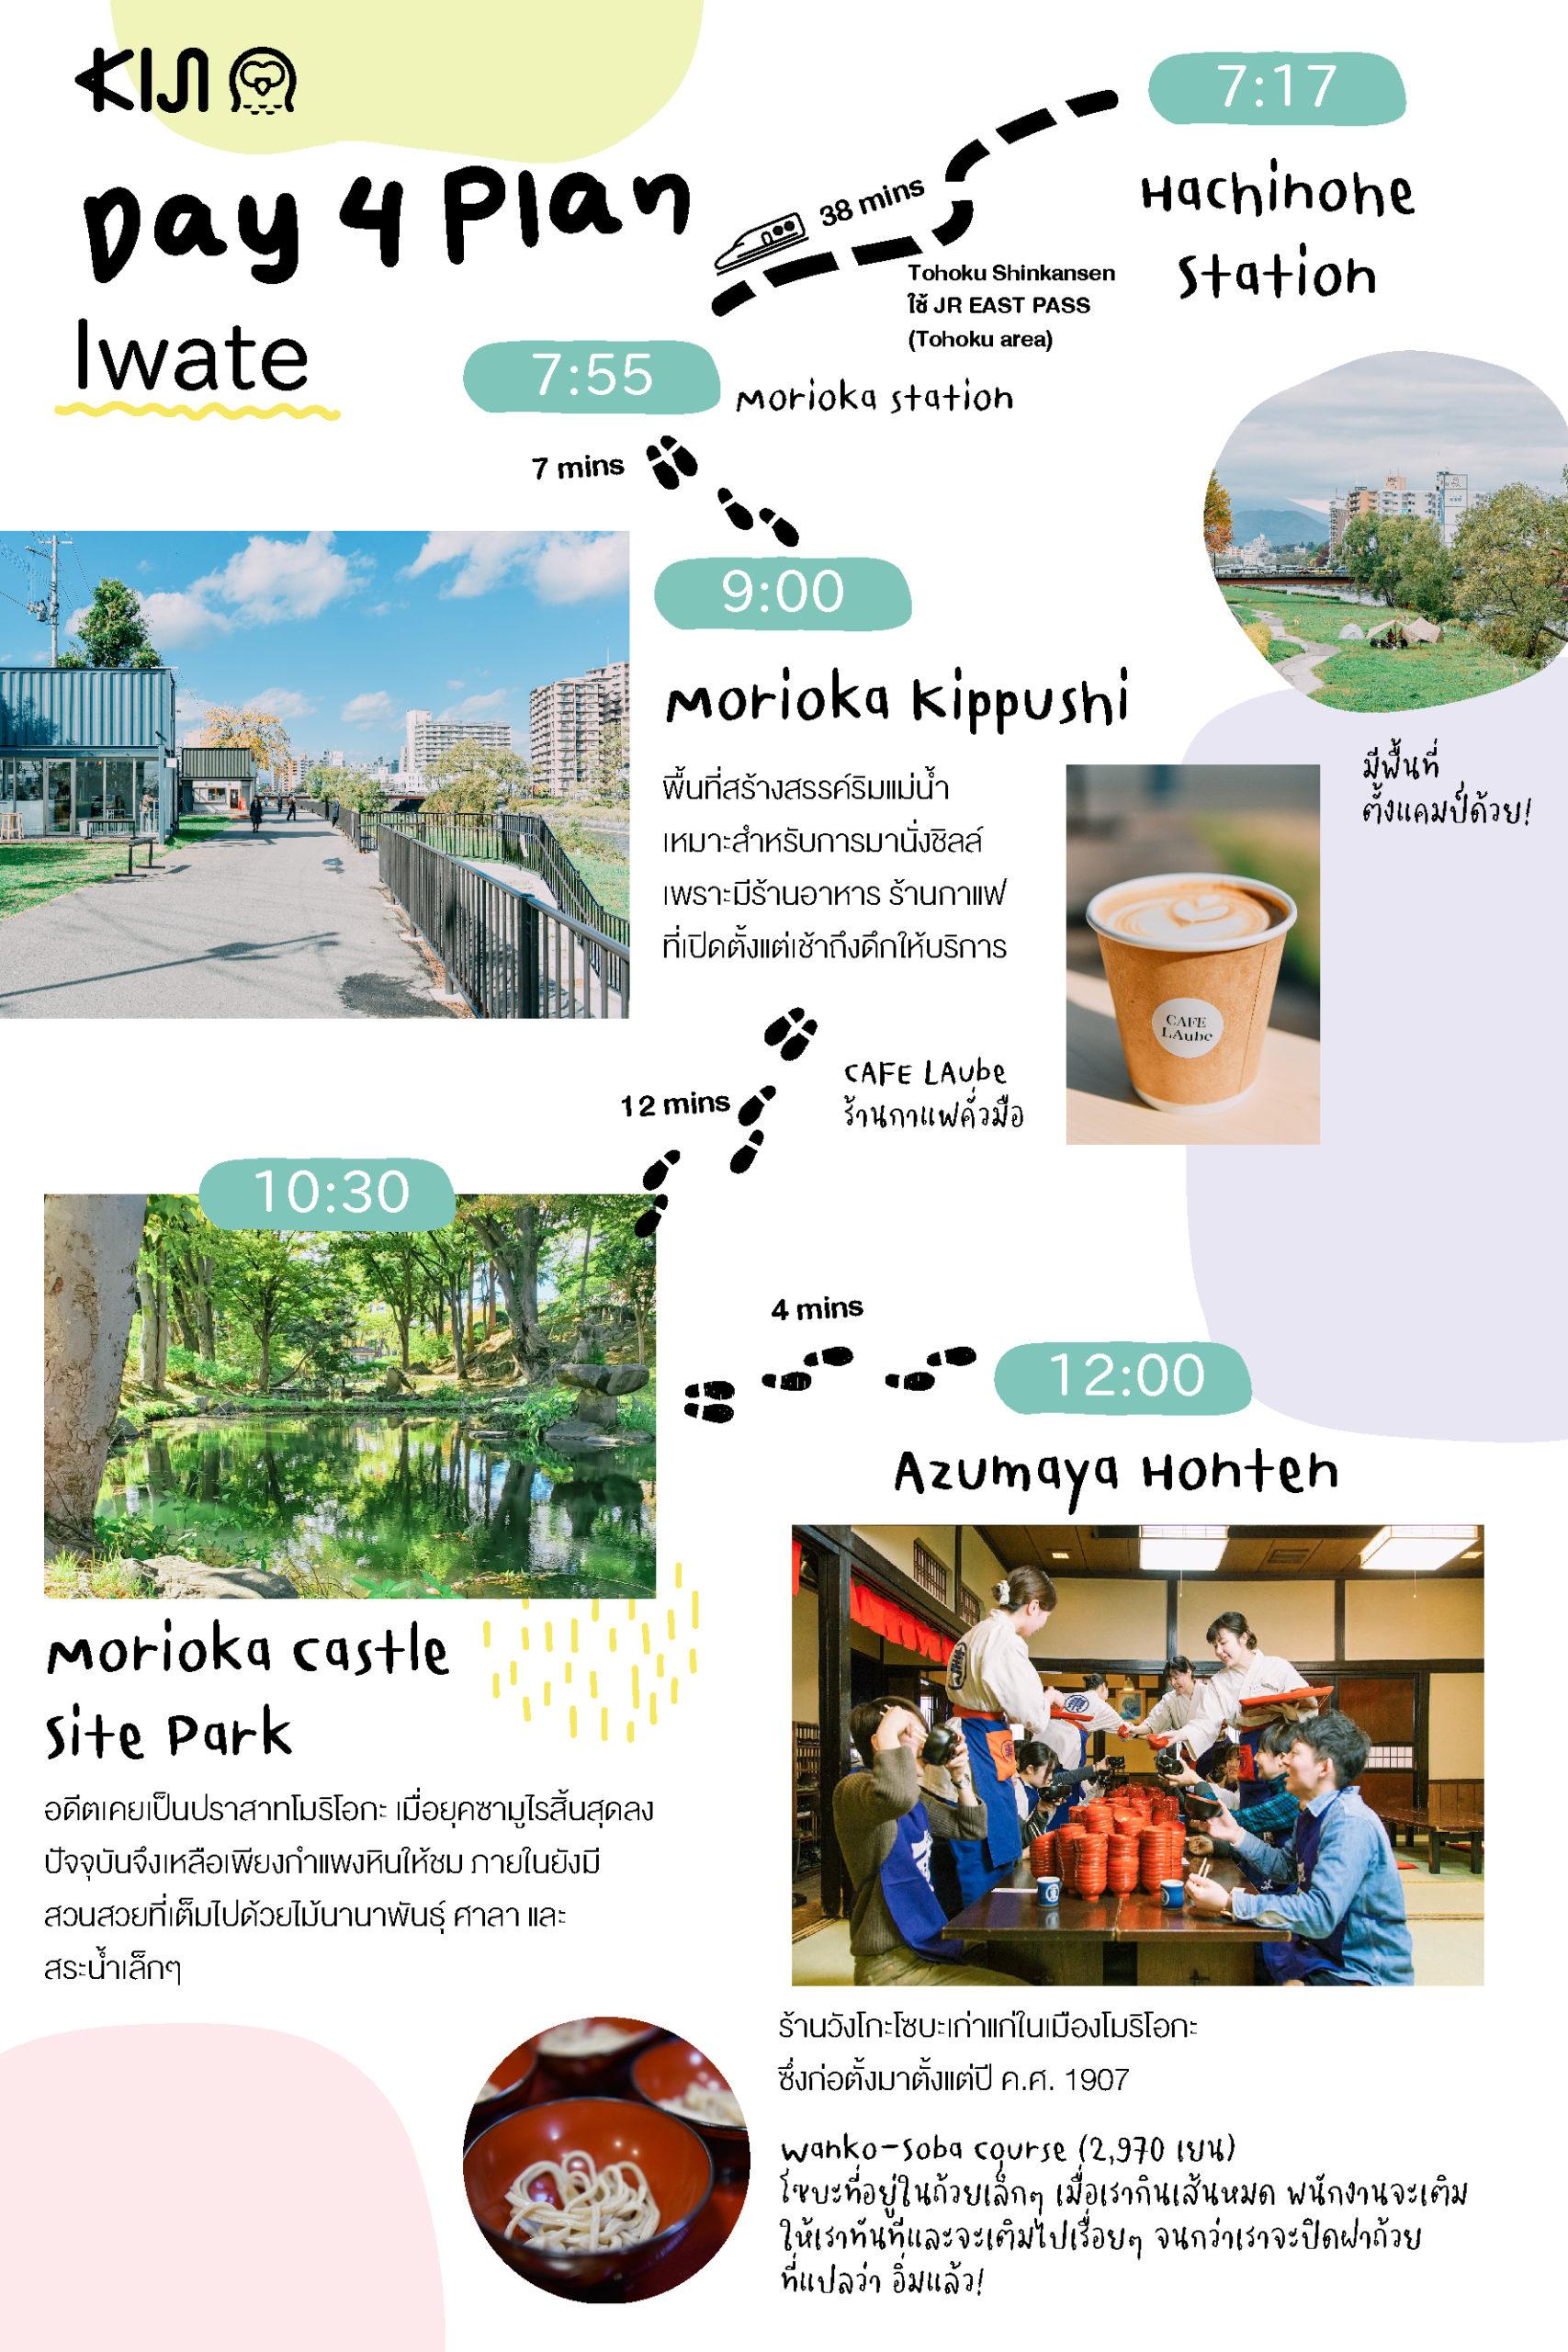 Day 4 : จาก อาโอโมริ (Aomori) ใช้บัตร JR EAST PASS (Tohoku area) นั่งชินคันเซ็นเที่ยวต่อที่ อิวาเตะ (Iwate)